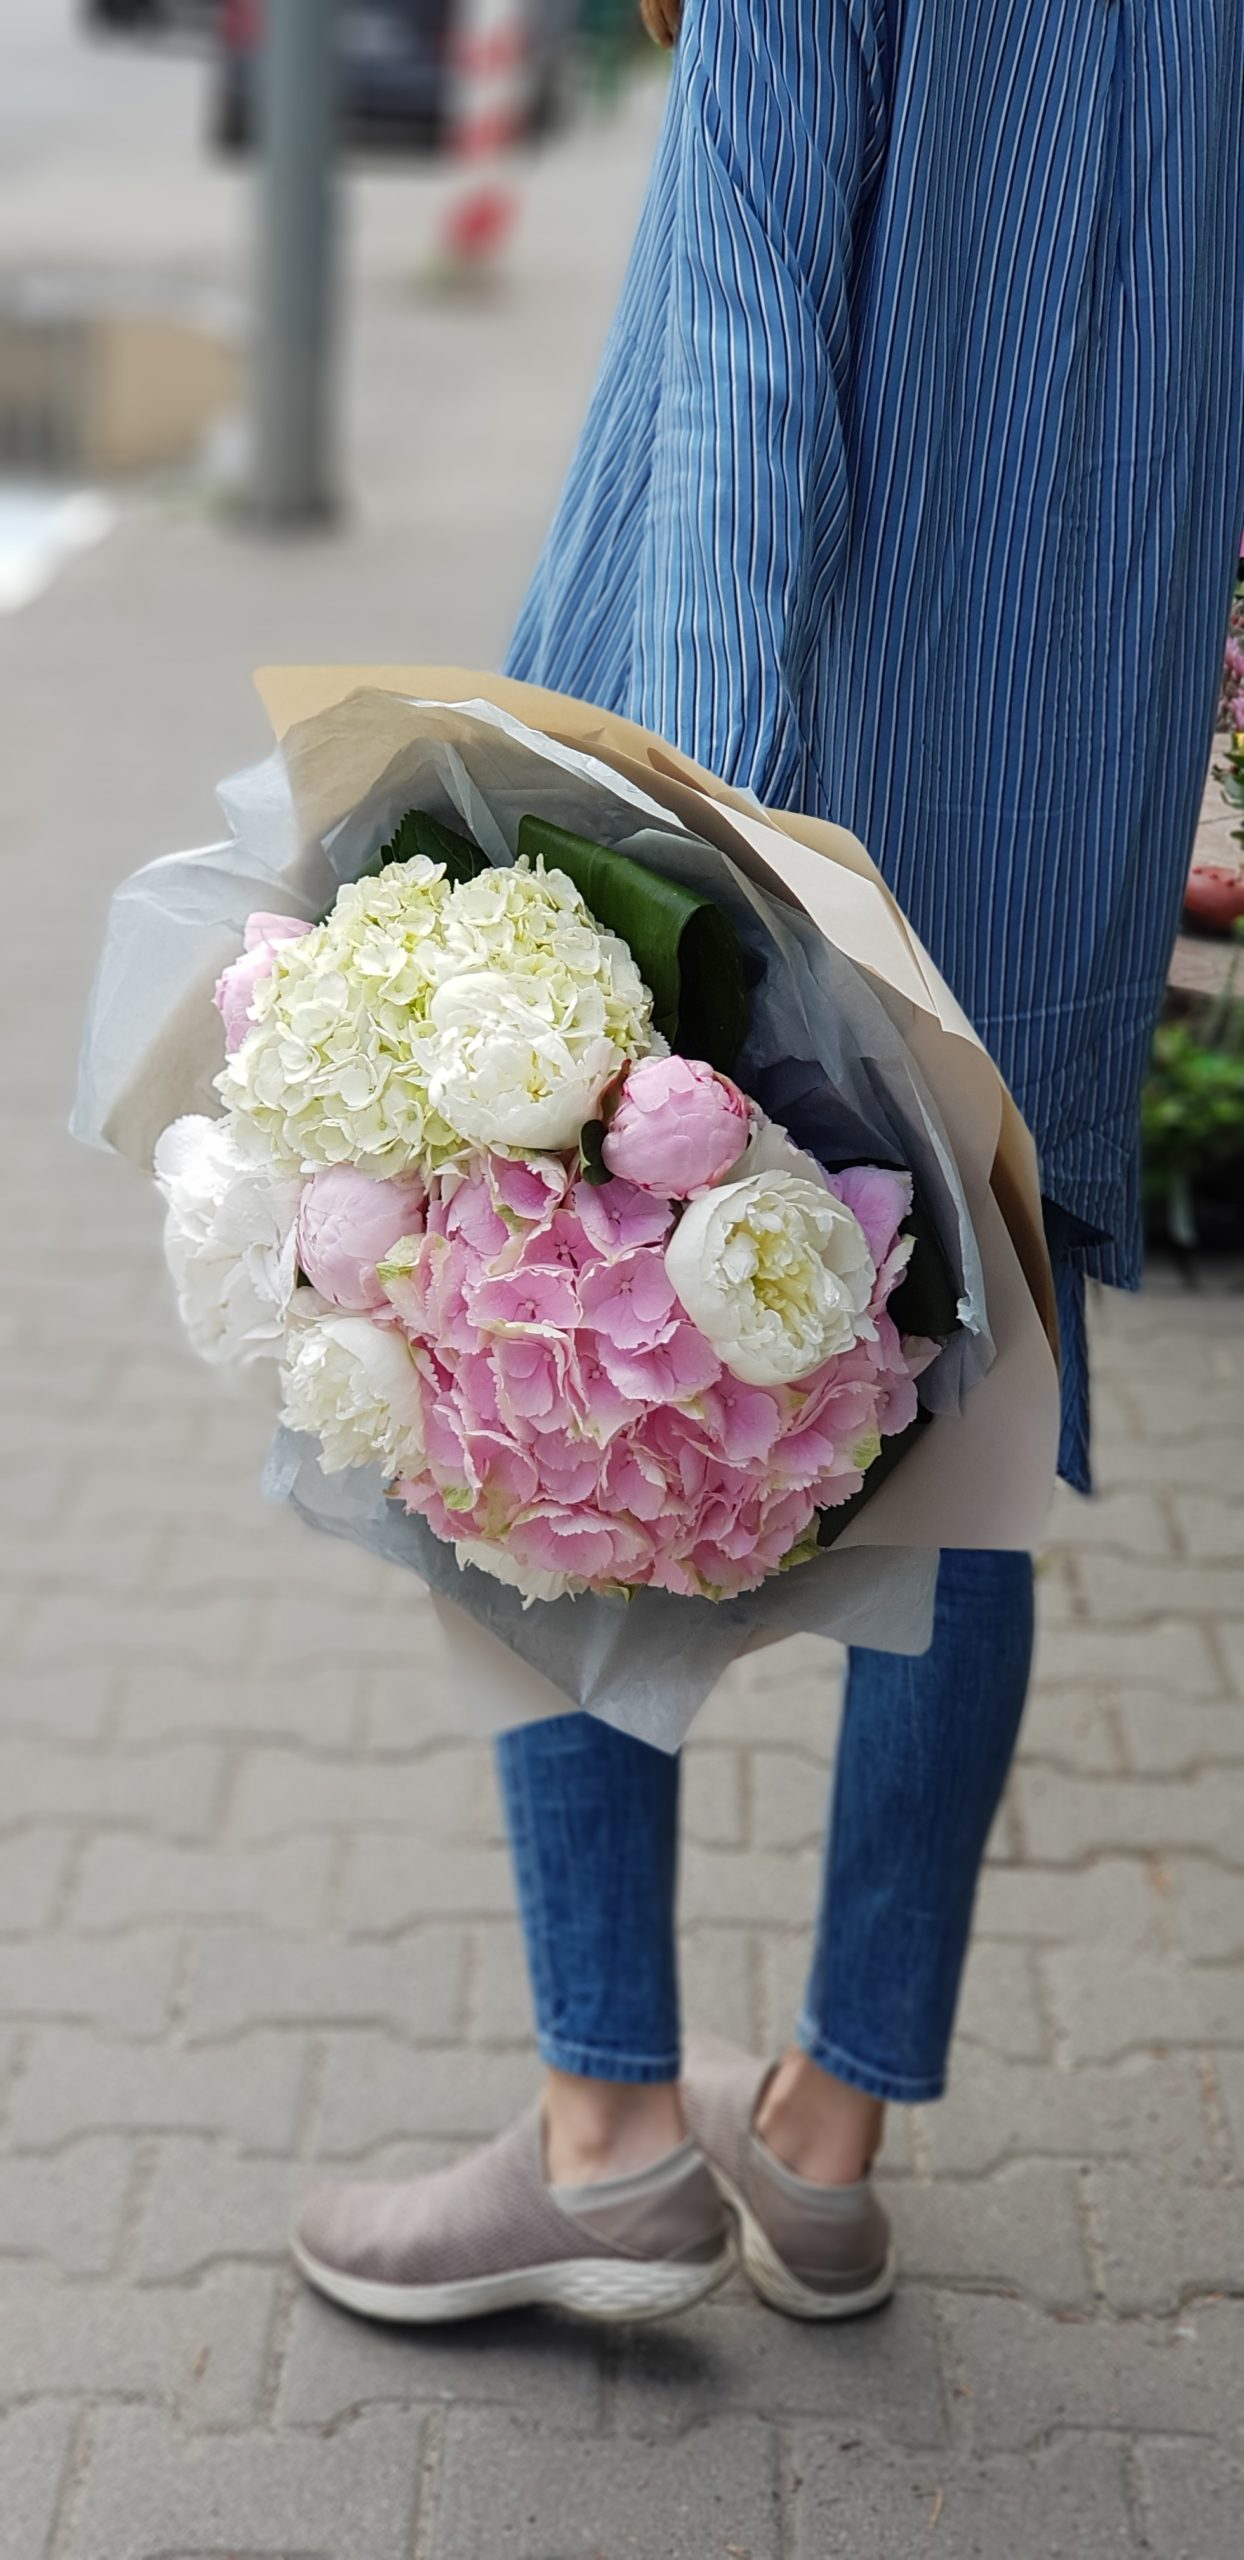 Buchet modern din flori delicate